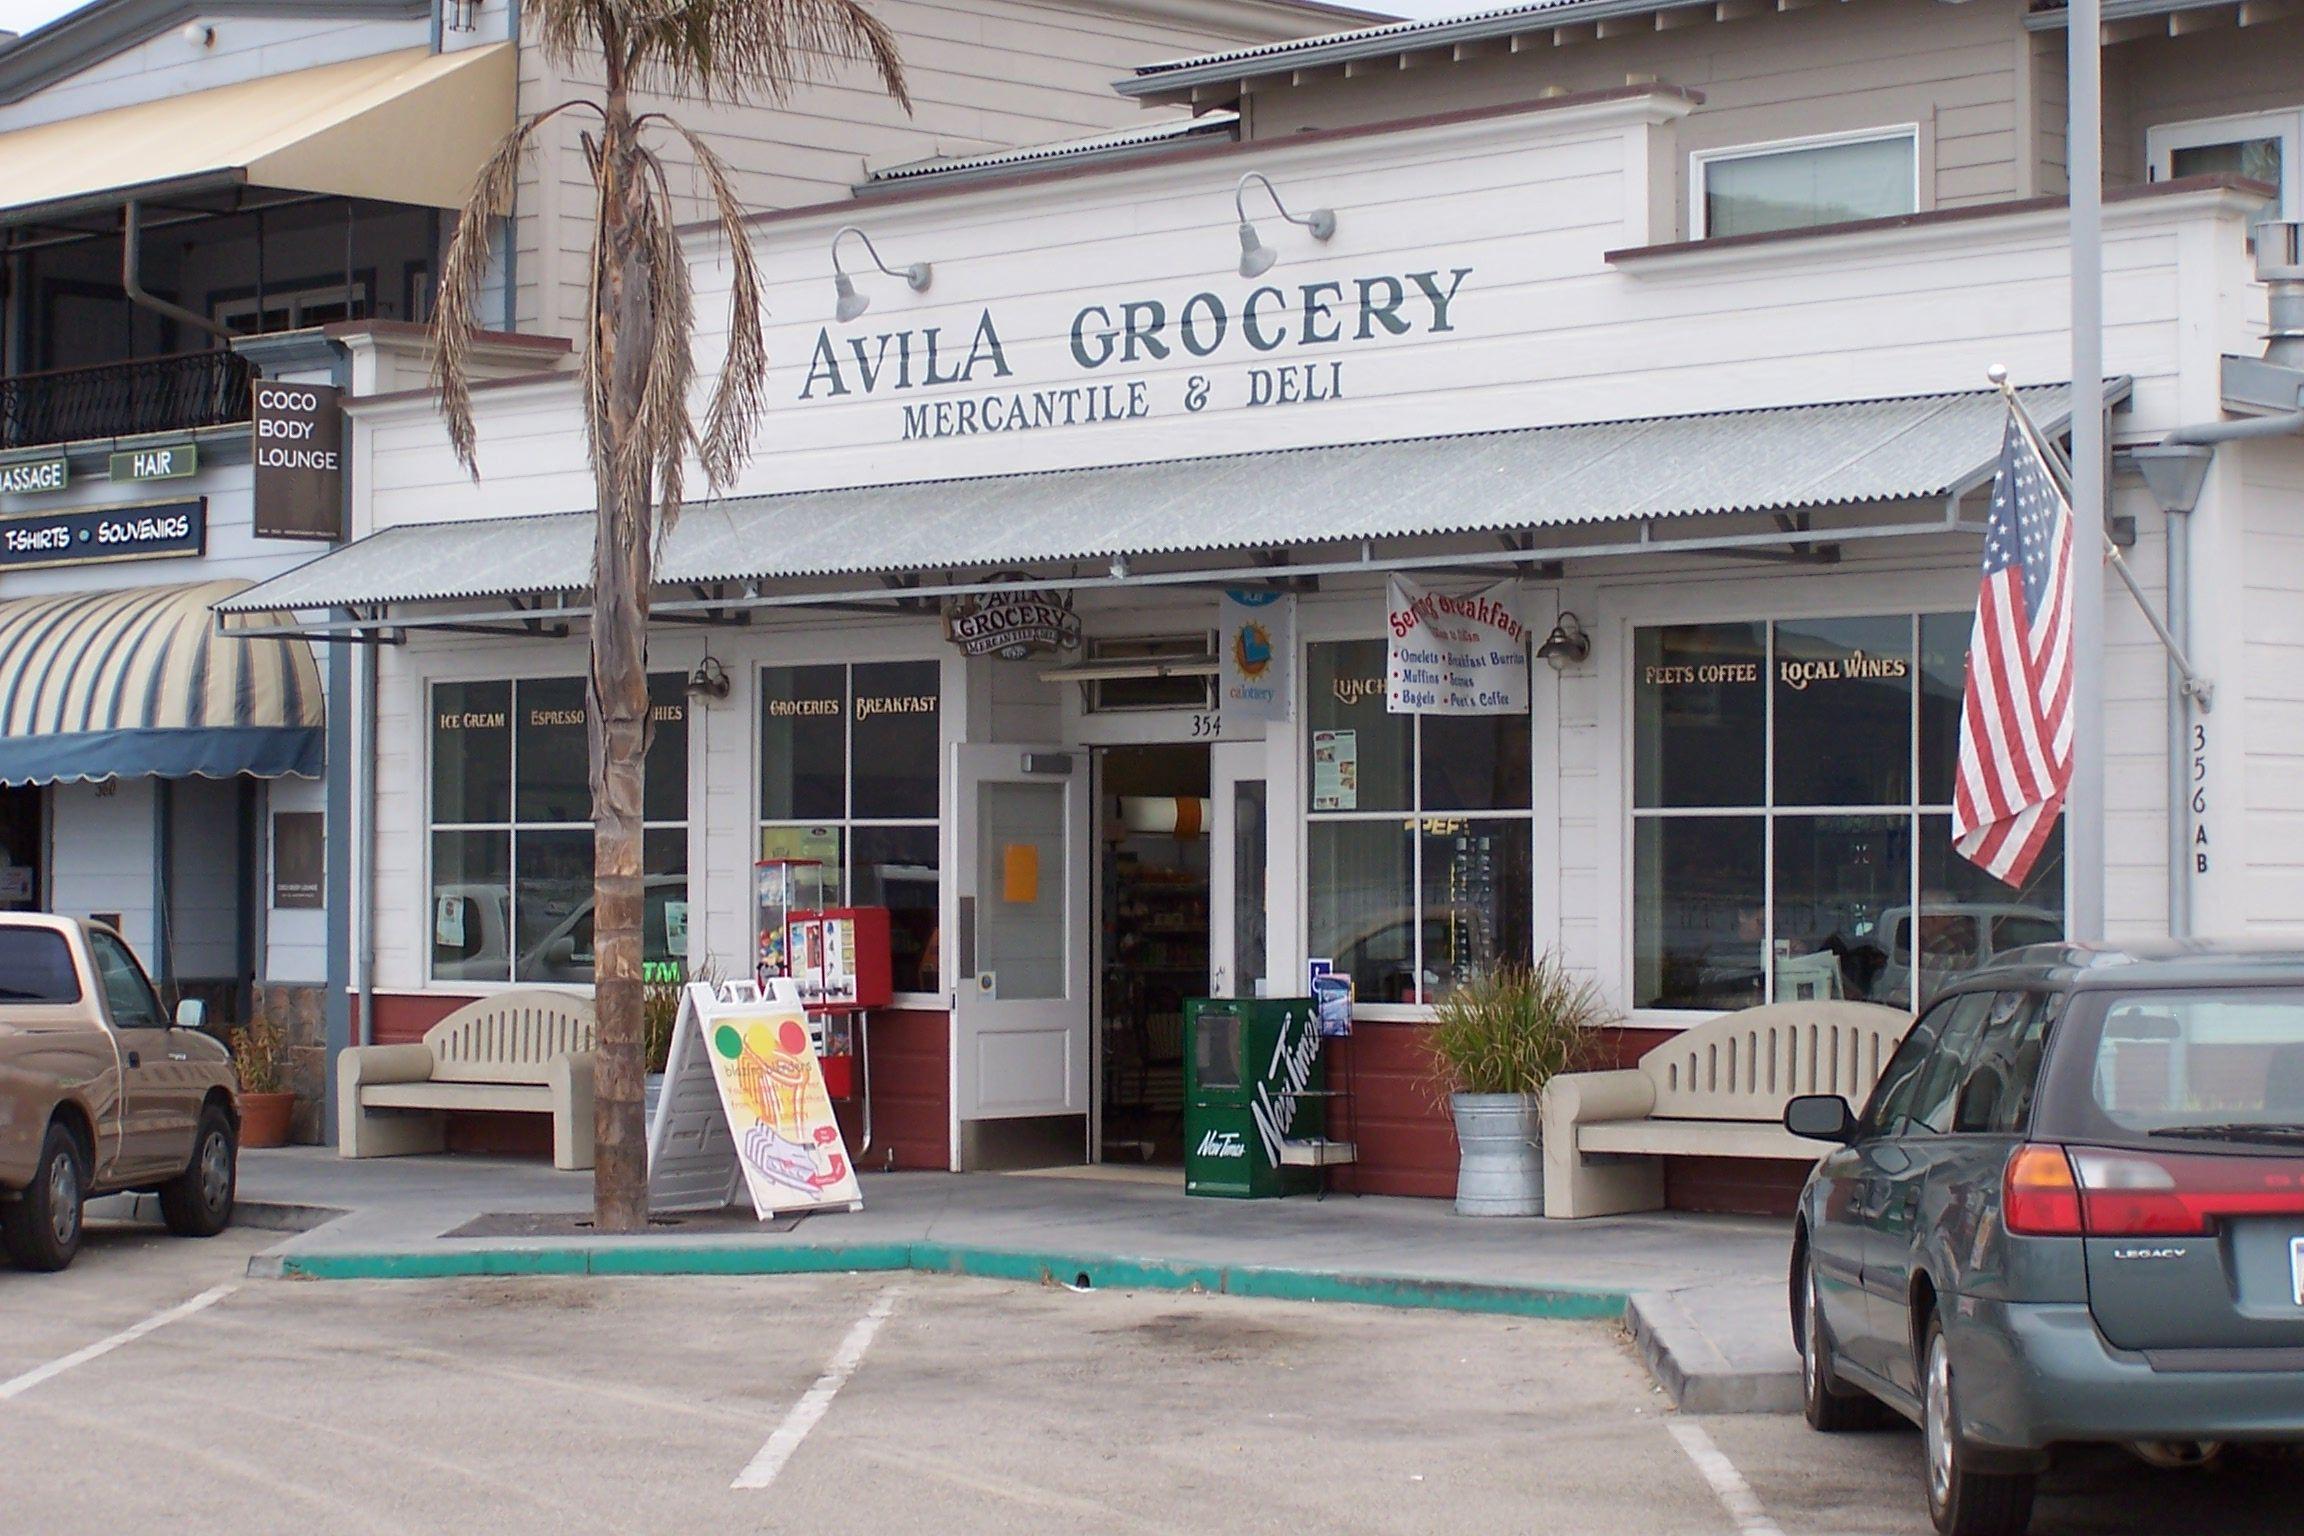 Avila Grocery In Beach Ca